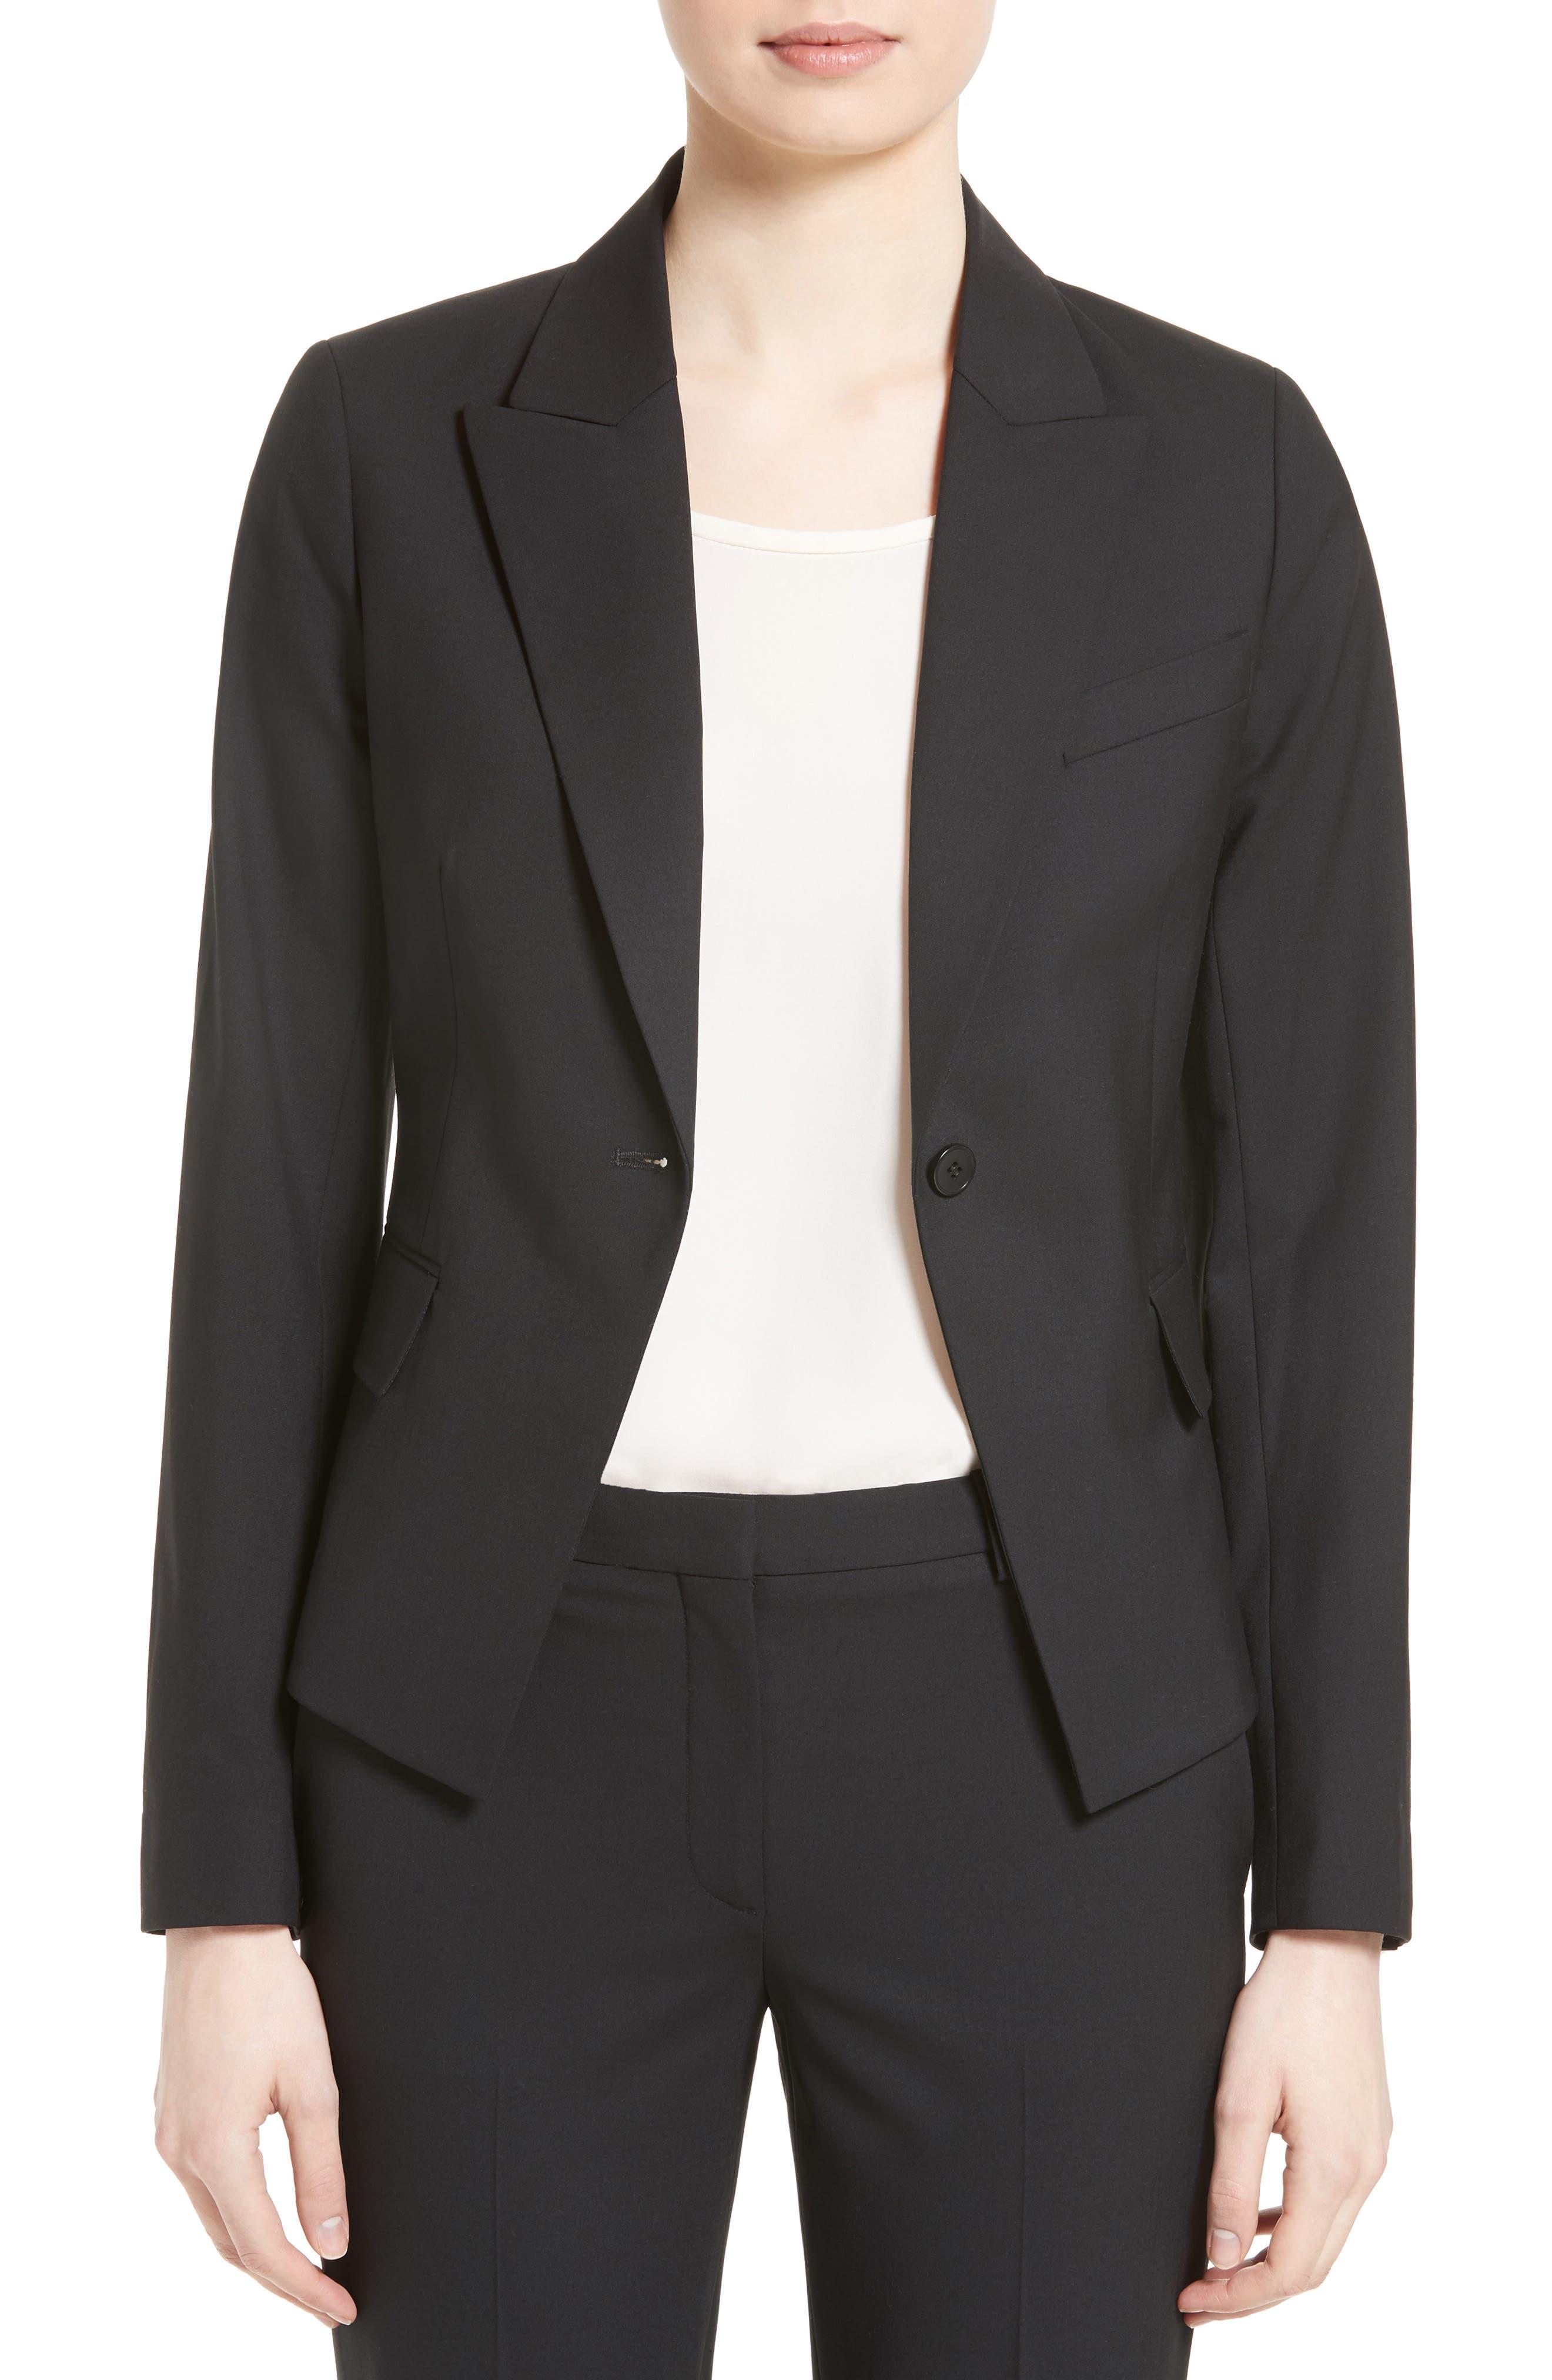 Brince B Good Wool Suit Jacket,                             Main thumbnail 1, color,                             BLACK